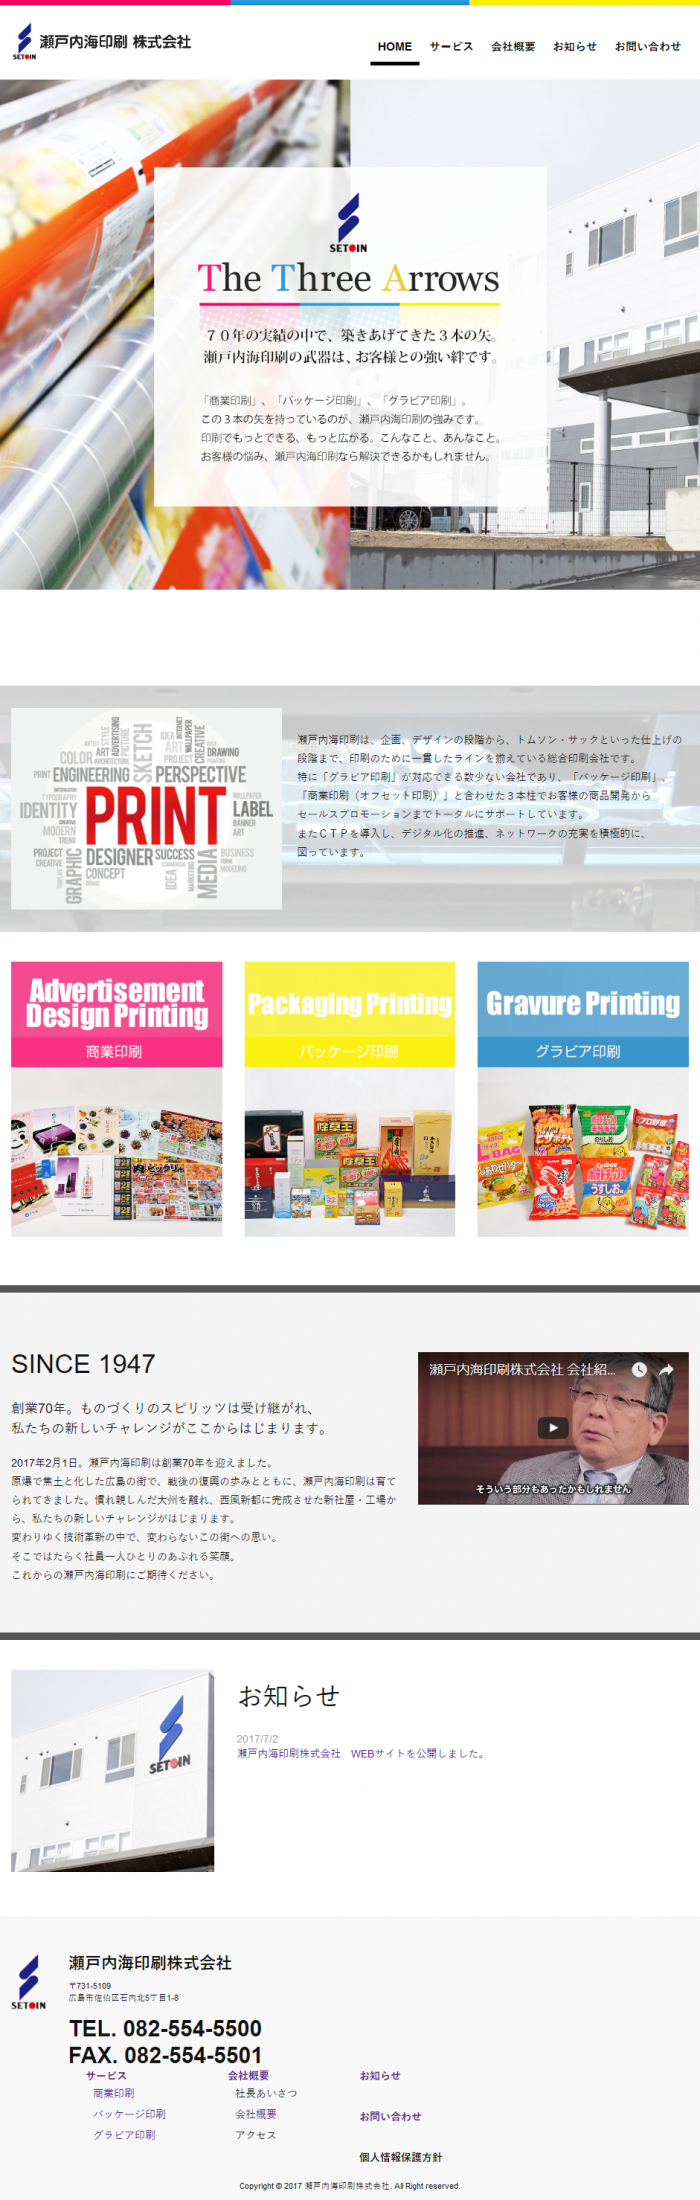 瀬戸内海印刷 株式会社様 WEBサイト制作